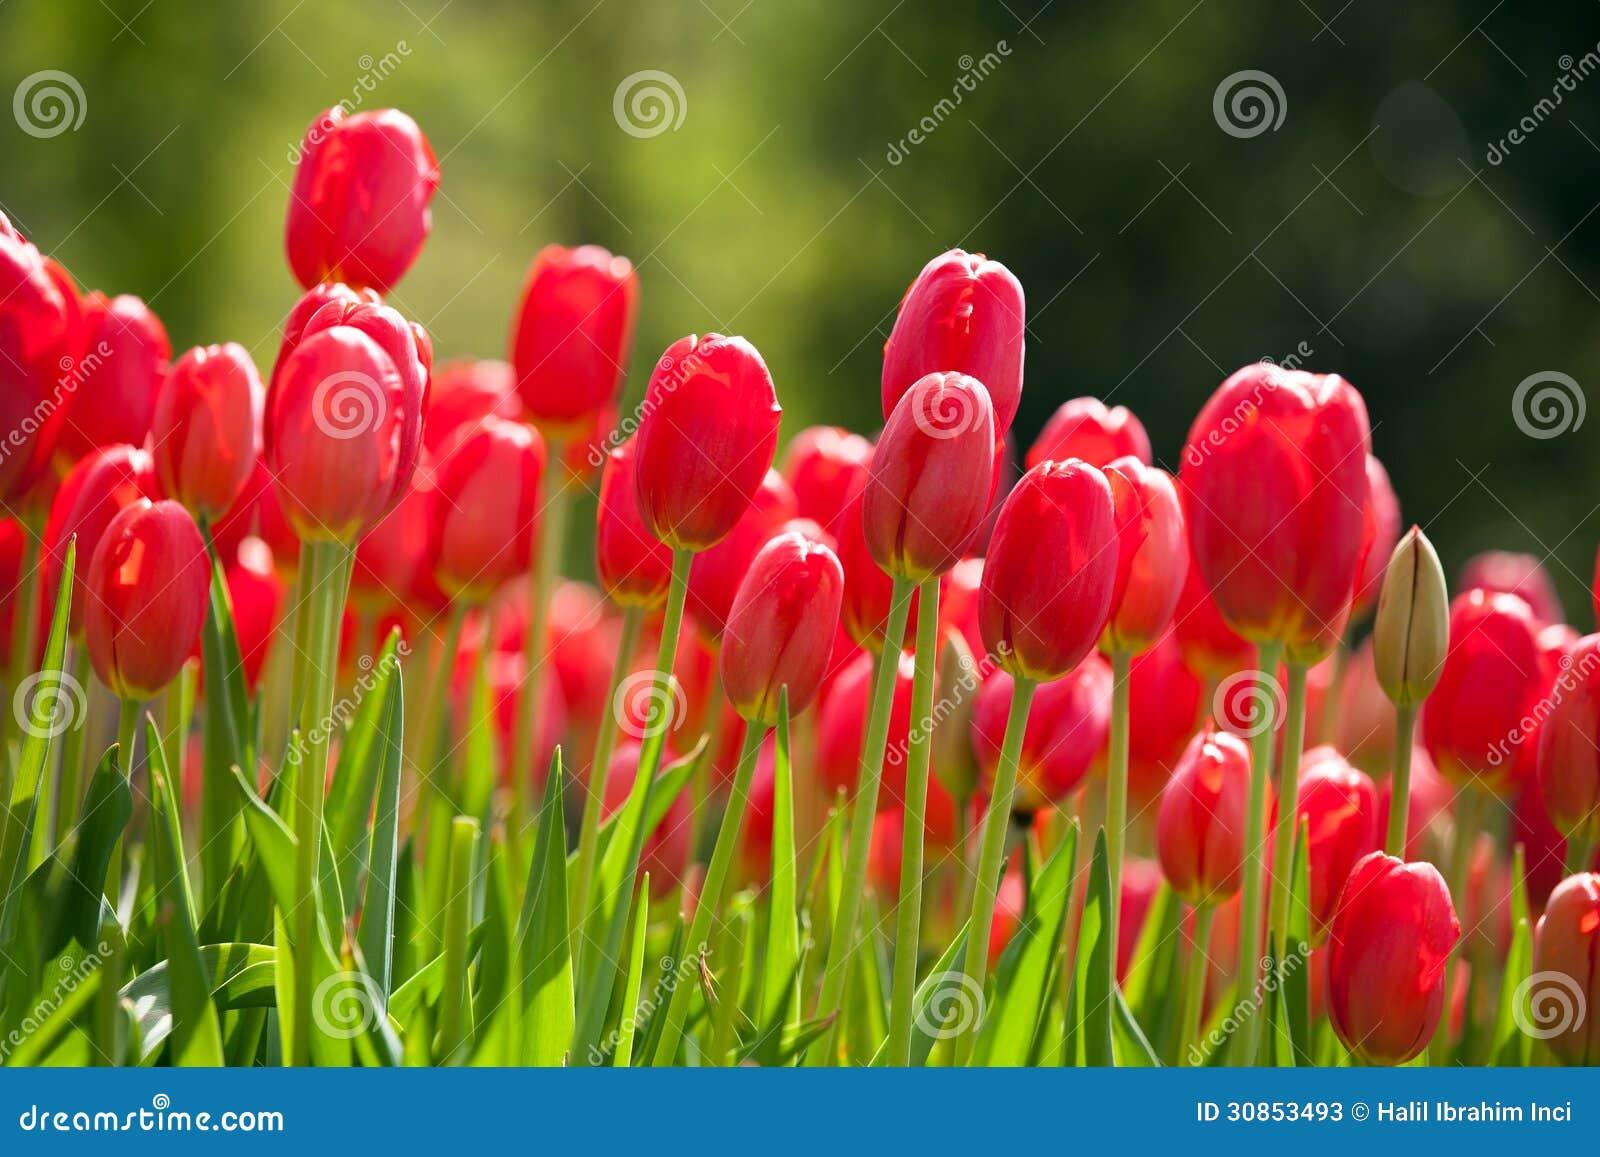 Rote Tulpen im Frühjahr